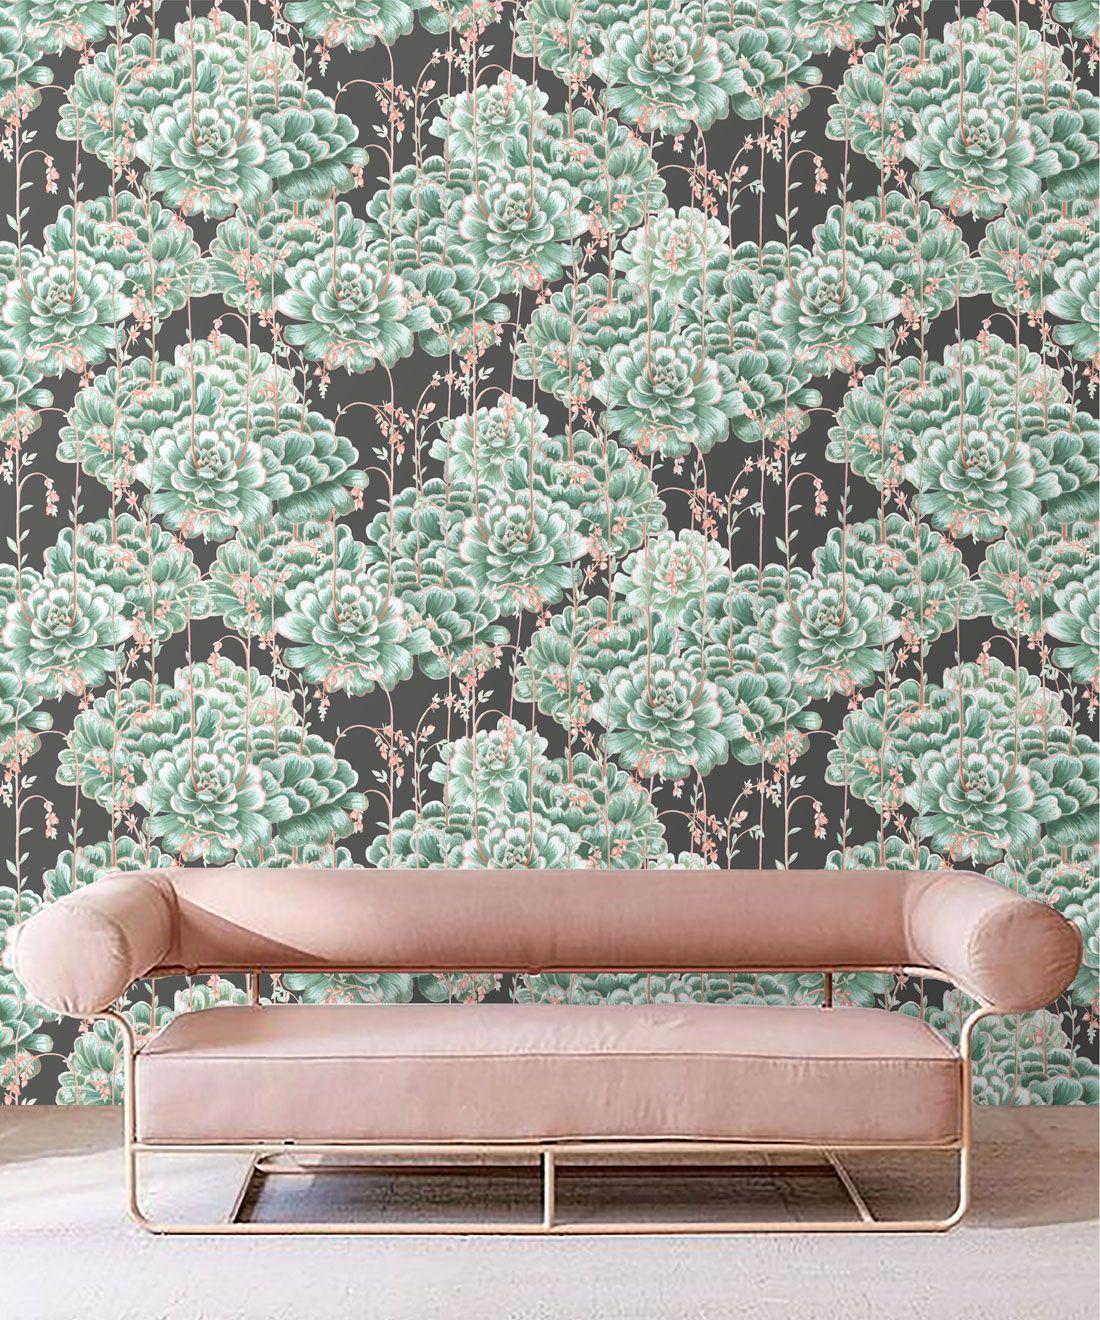 Succulents Wallpaper Green Charcoal • Cactus Wallpaper • Desert Wallpaper Insitu on black background behind pink sofa